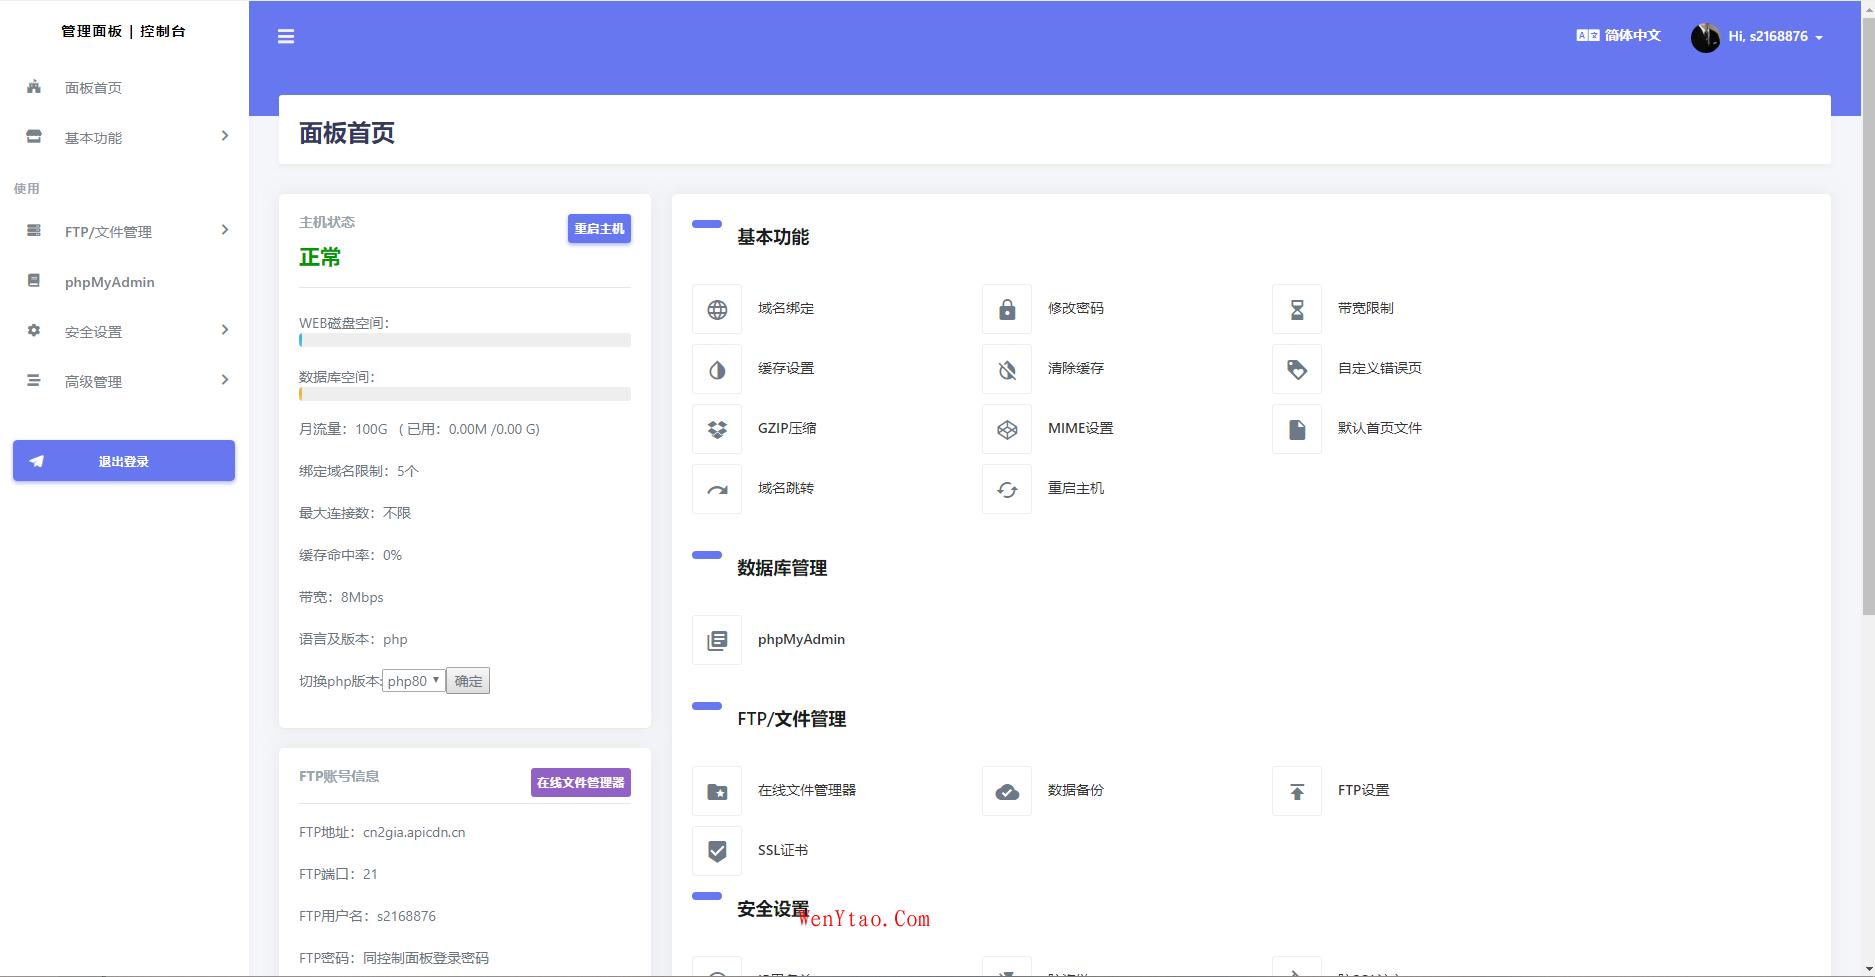 New Cloud - Kangle脚本 自带精品模板+用户自定义防CC 第3张